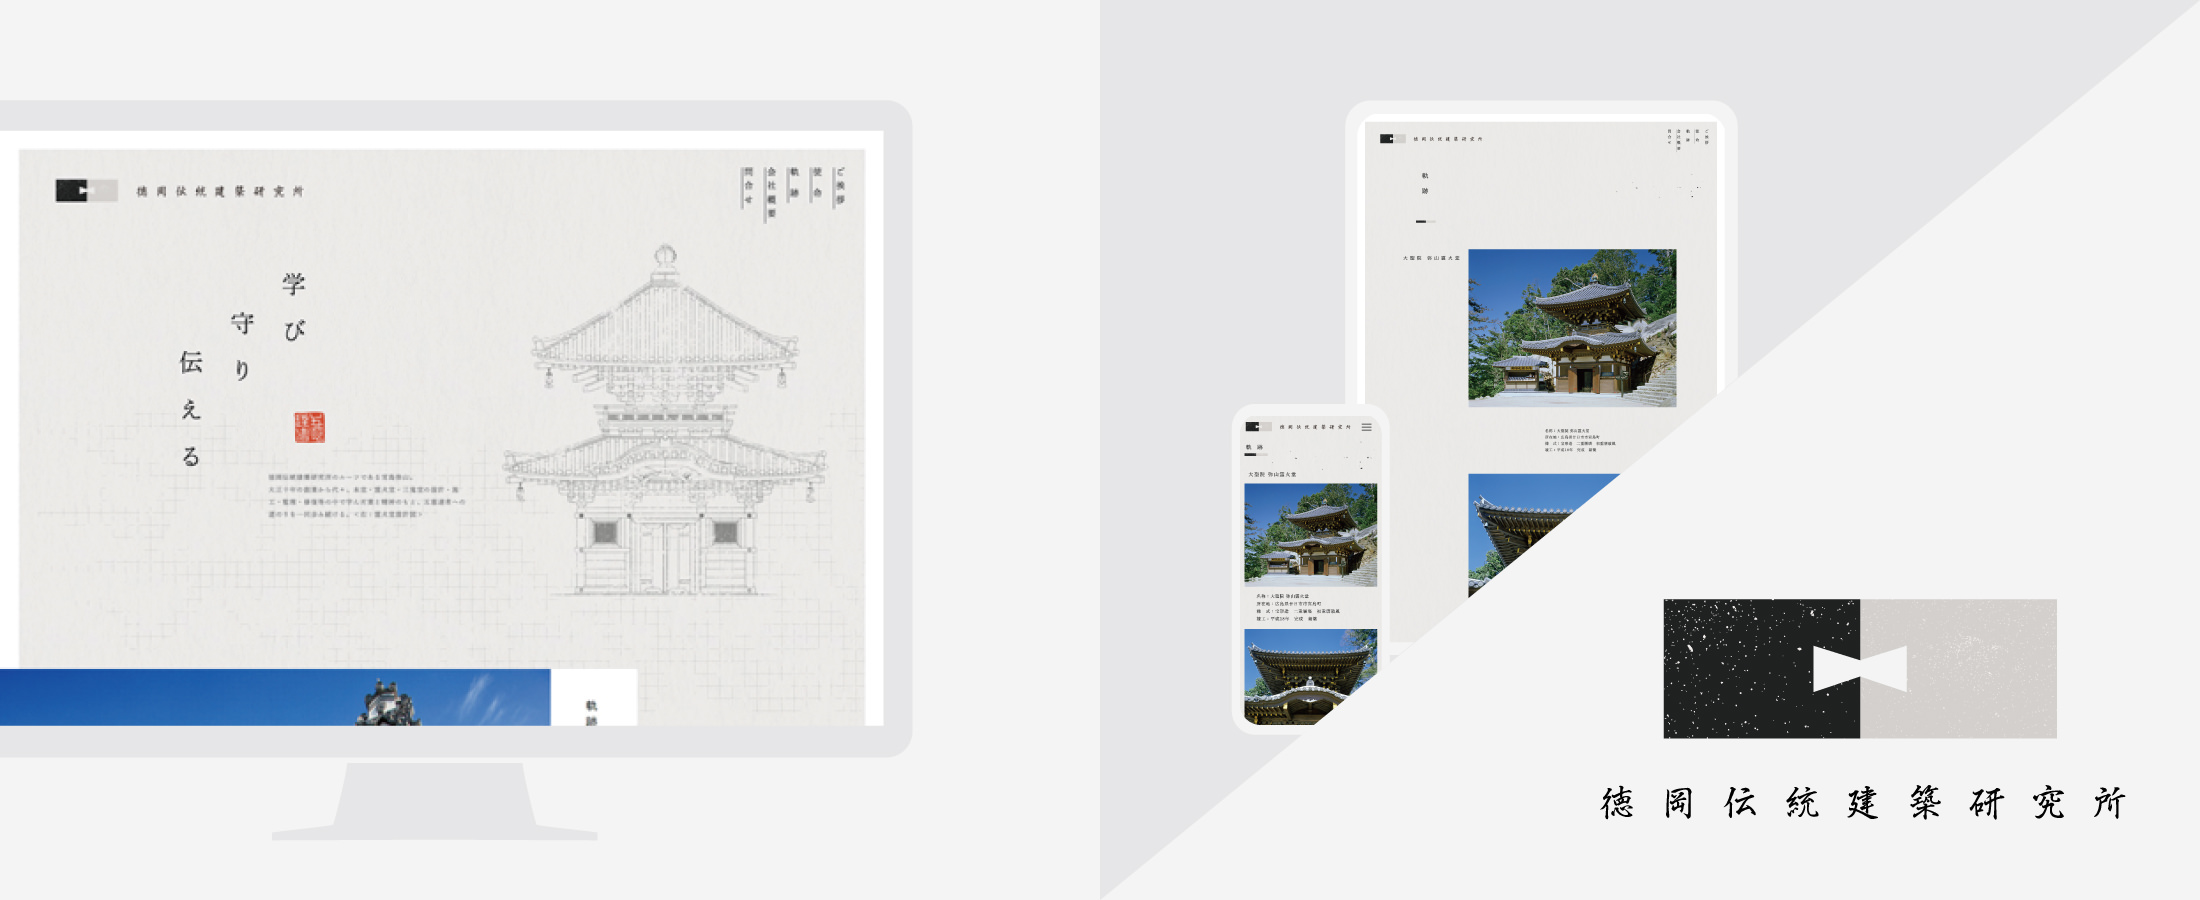 徳岡伝統建築研究所 様 | ホームページ制作事例